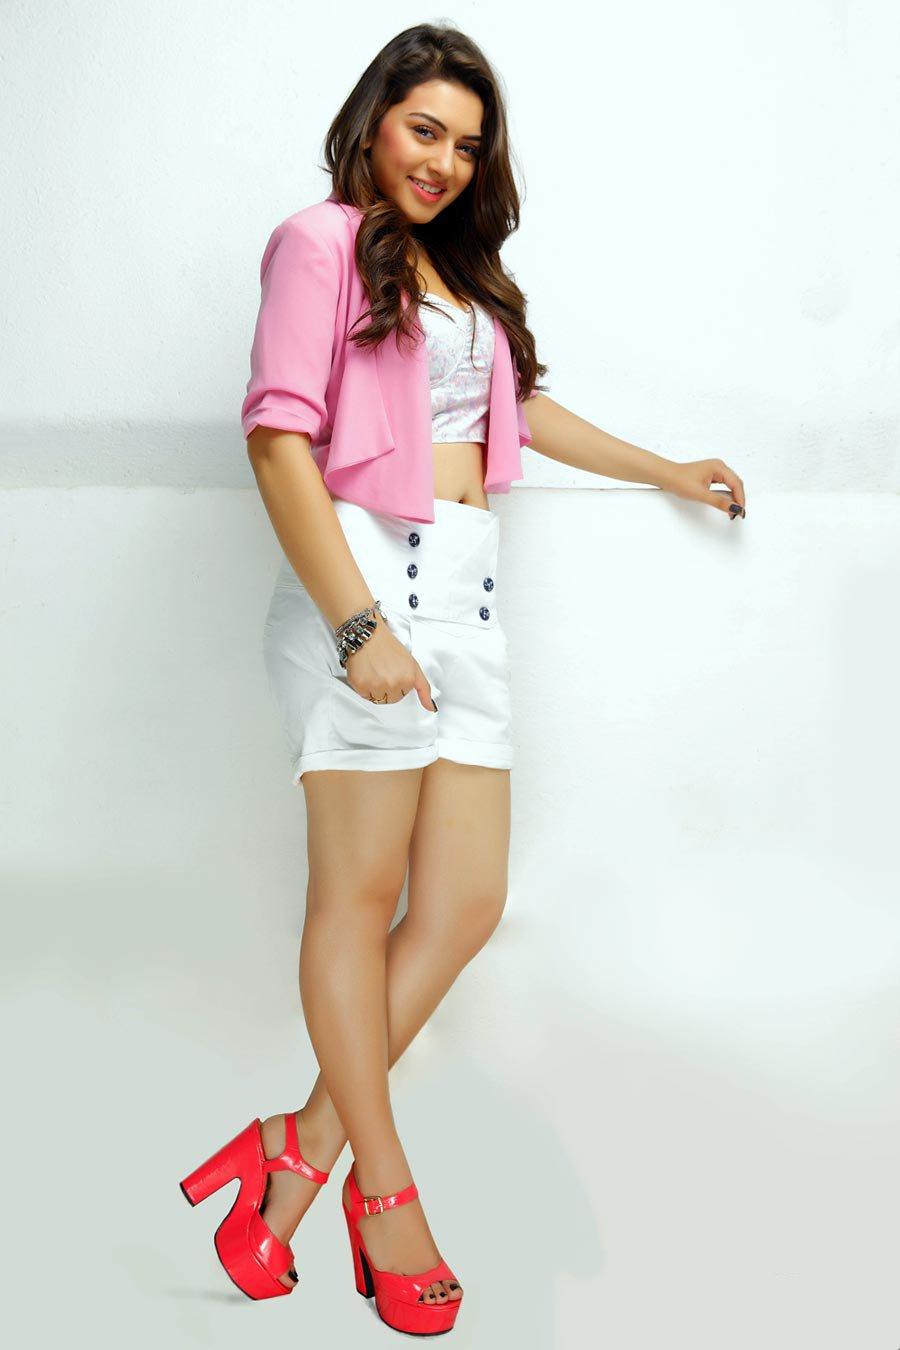 Tamil Heroine Hansika Motwani Hot In Mini White Short